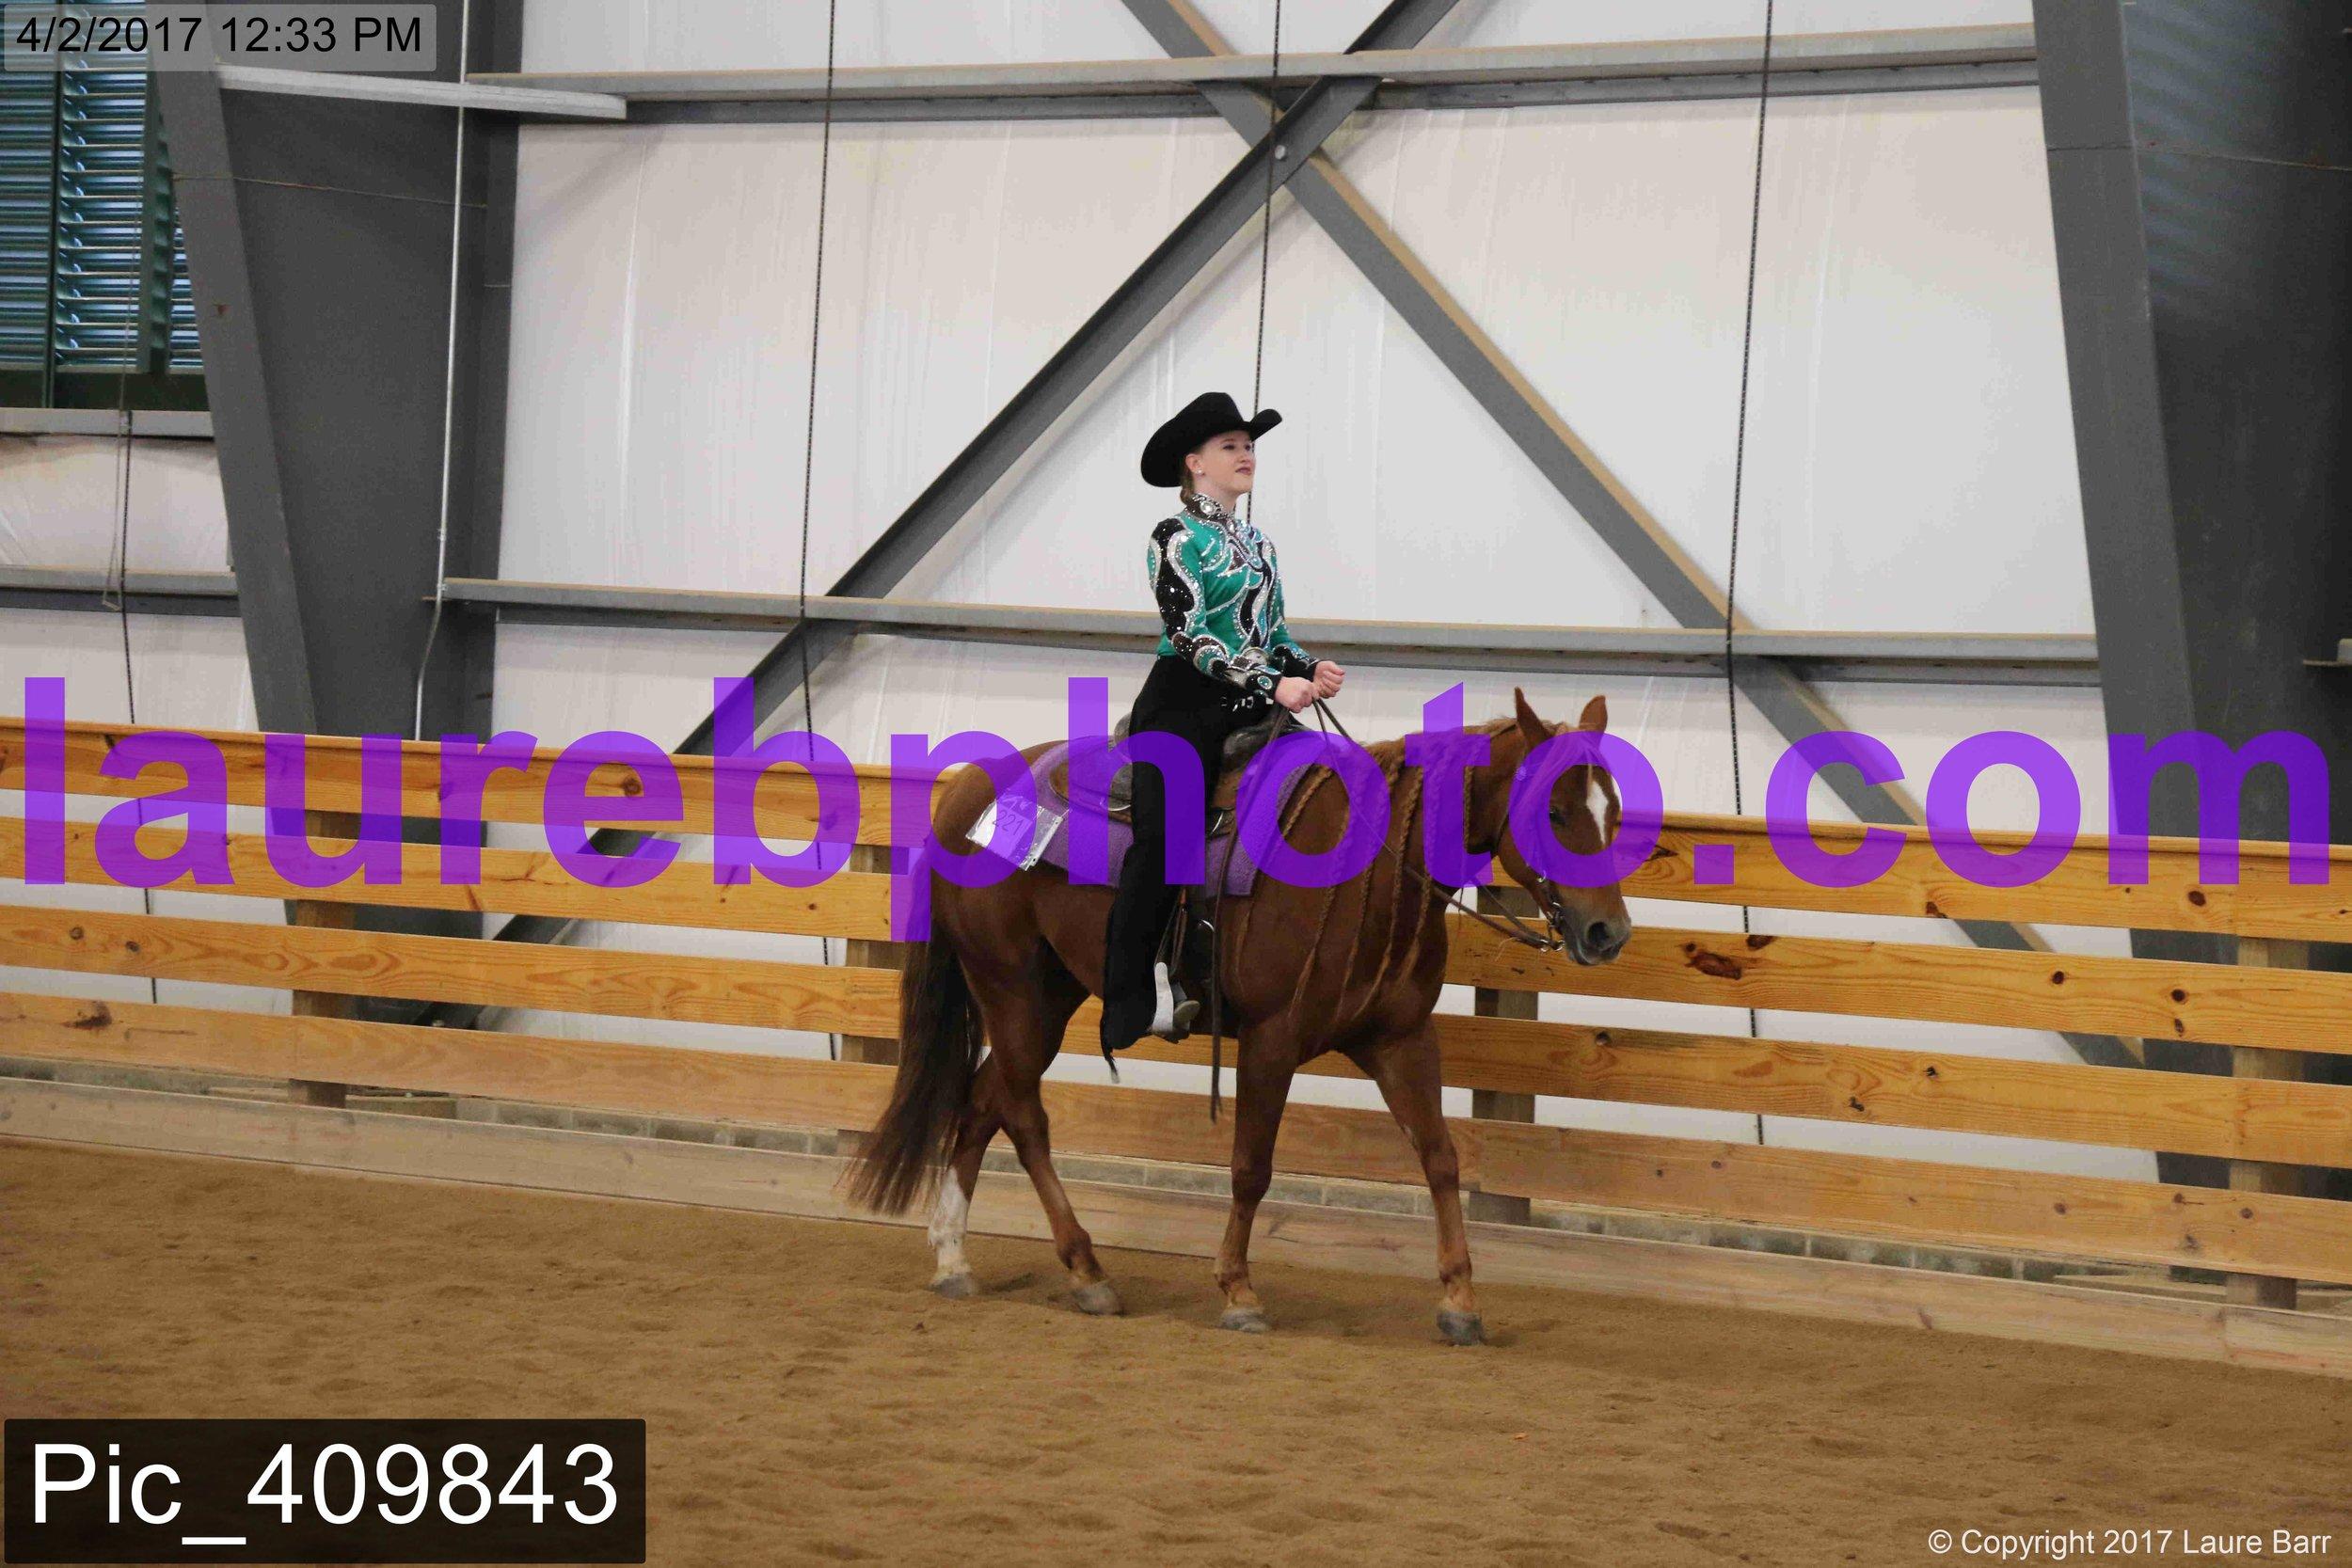 Pic_409843.jpg